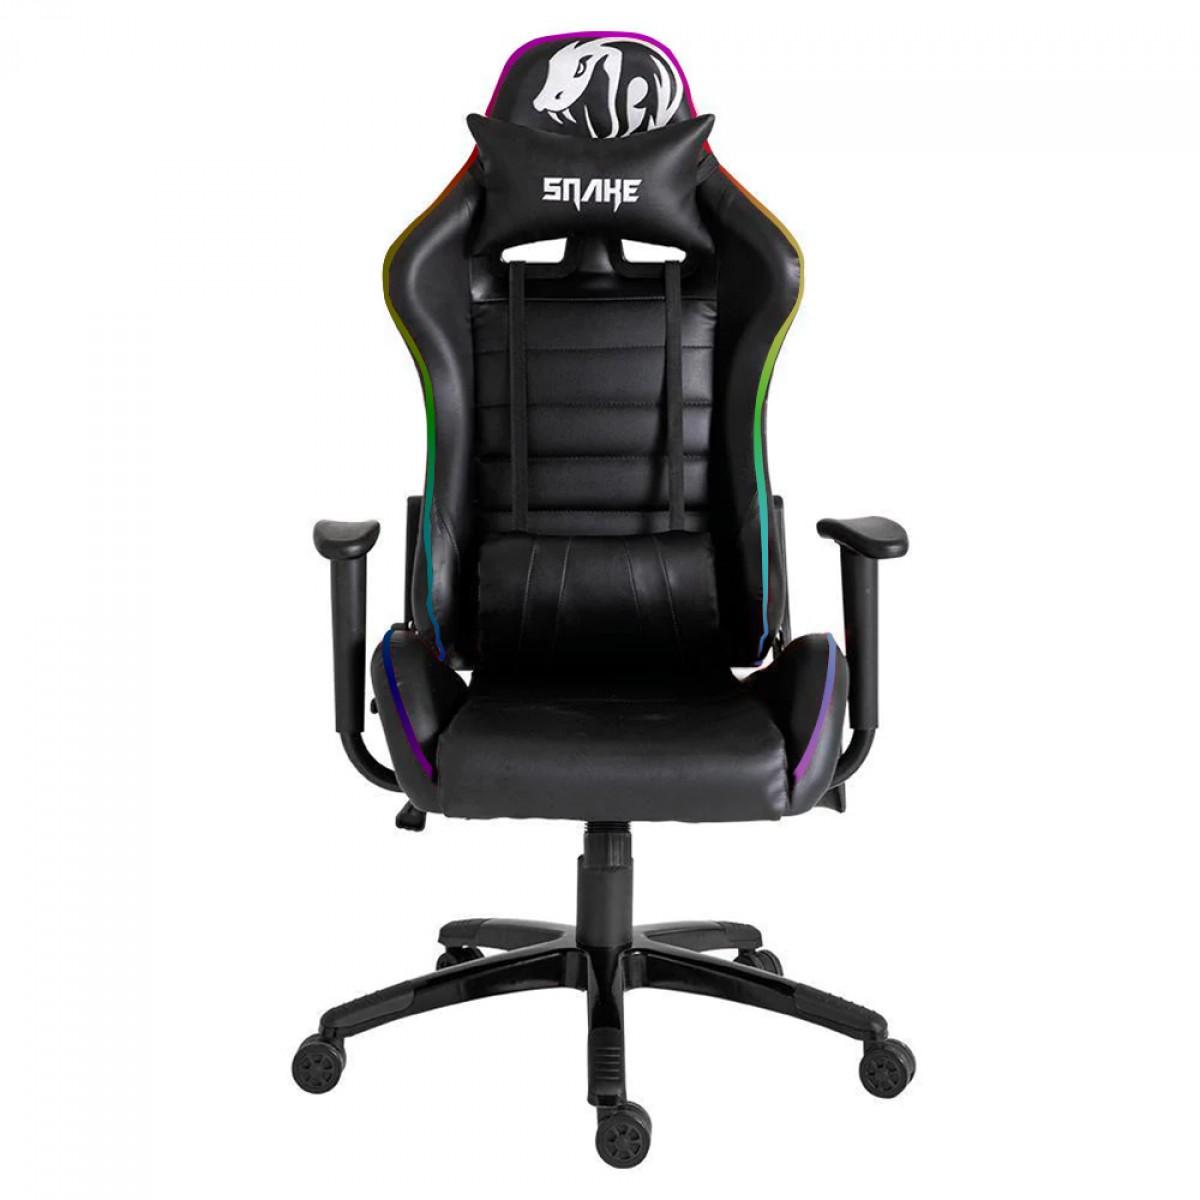 Cadeira Gamer Snake Coral Gaming, LED RGB, Black, Coral 580